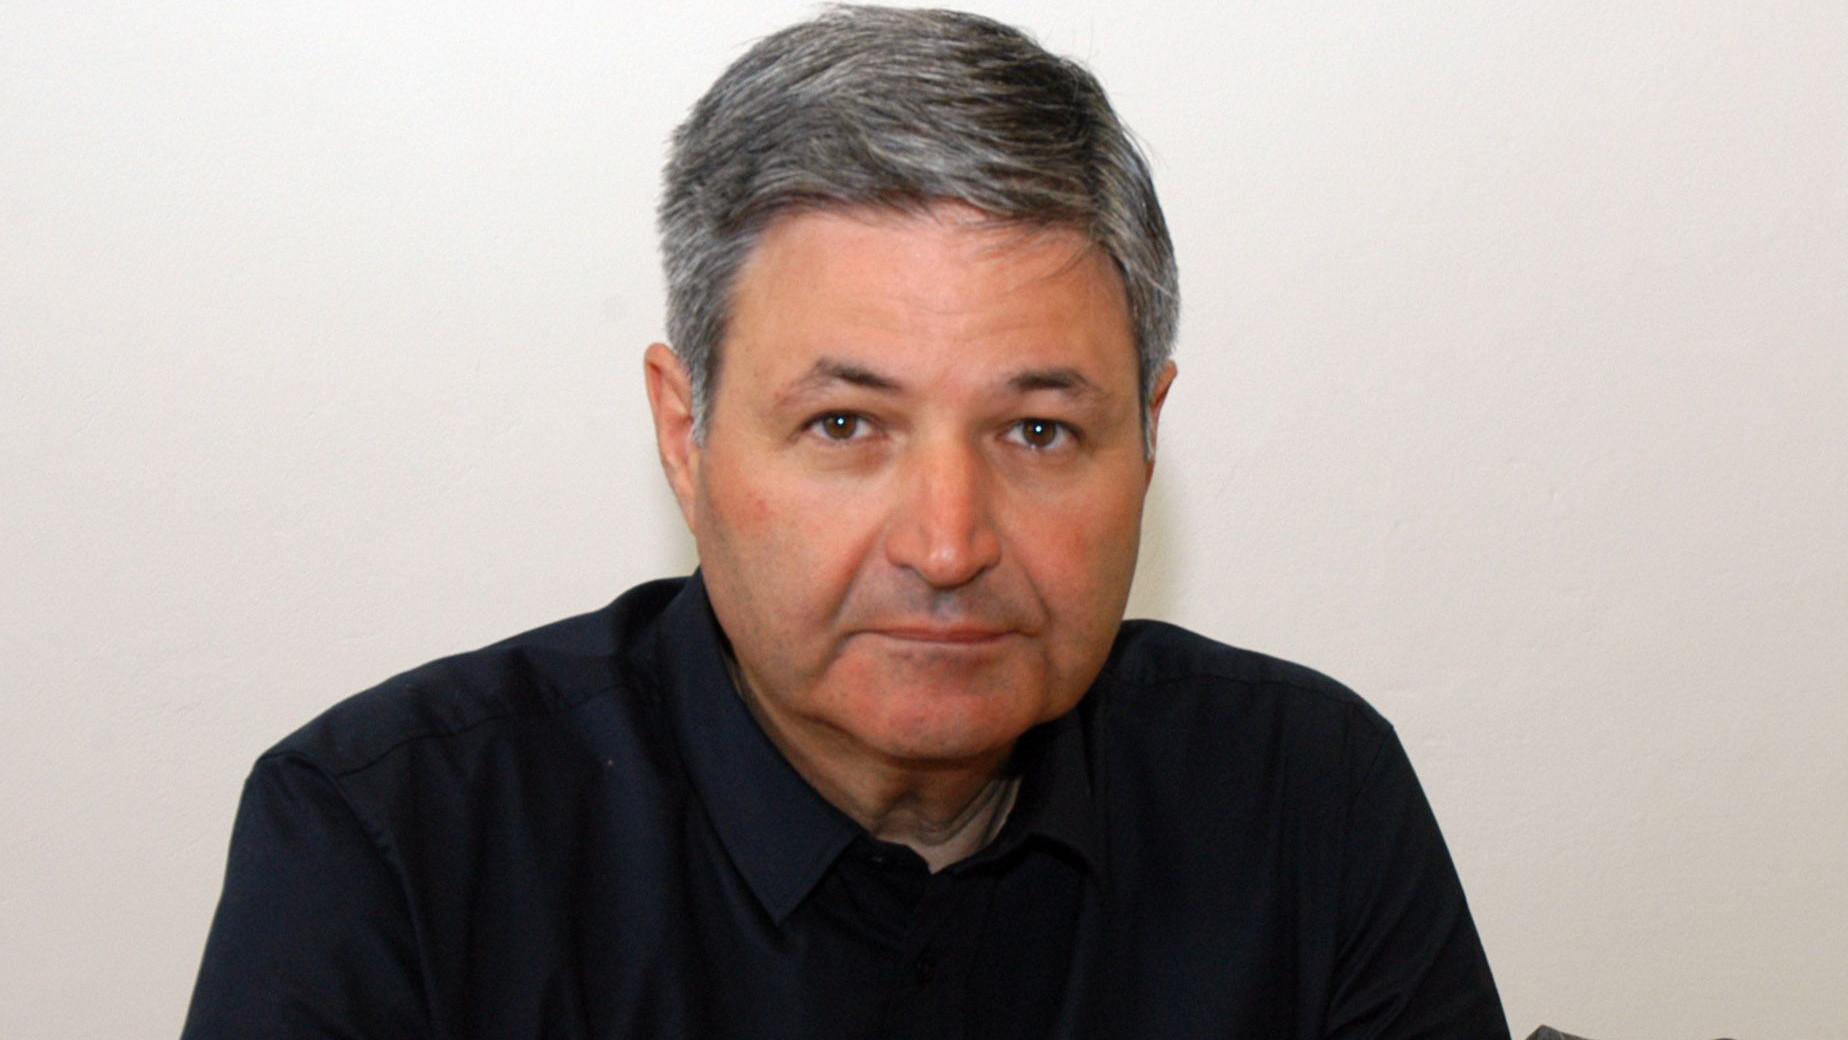 Massimo Carlesi direttore caritas di Prato